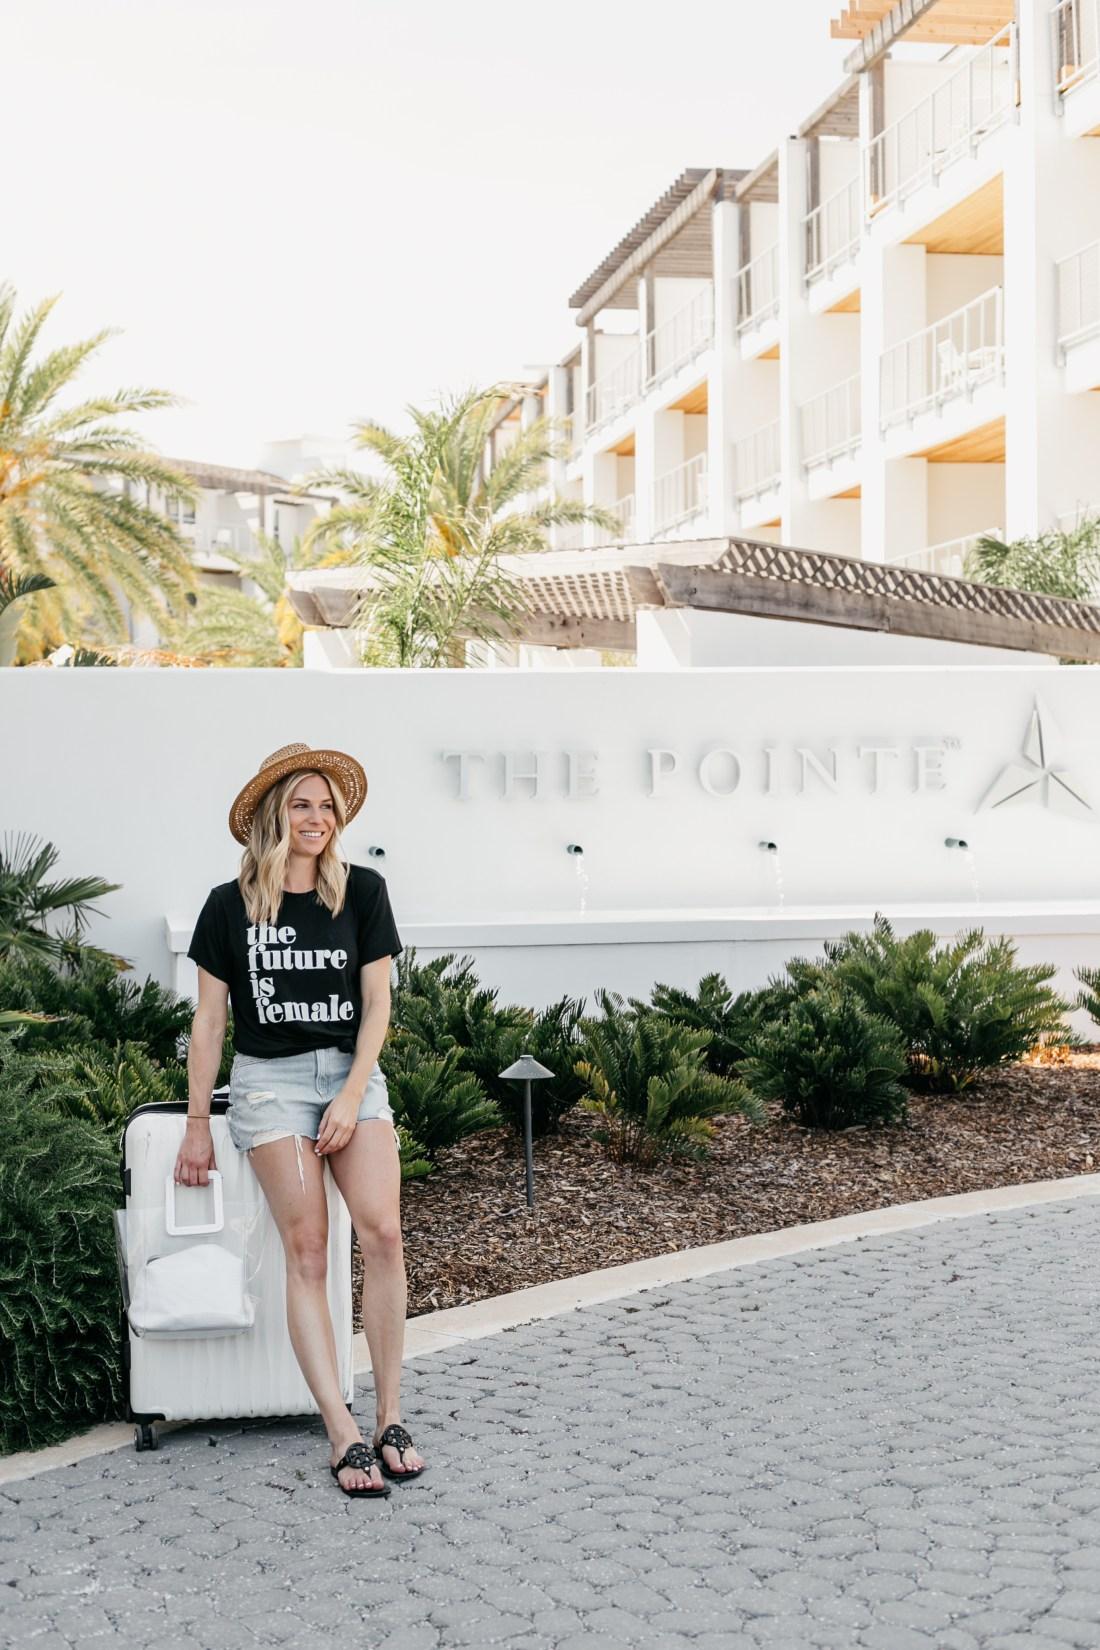 ROSEMARY BEACH 30A - The Pointe